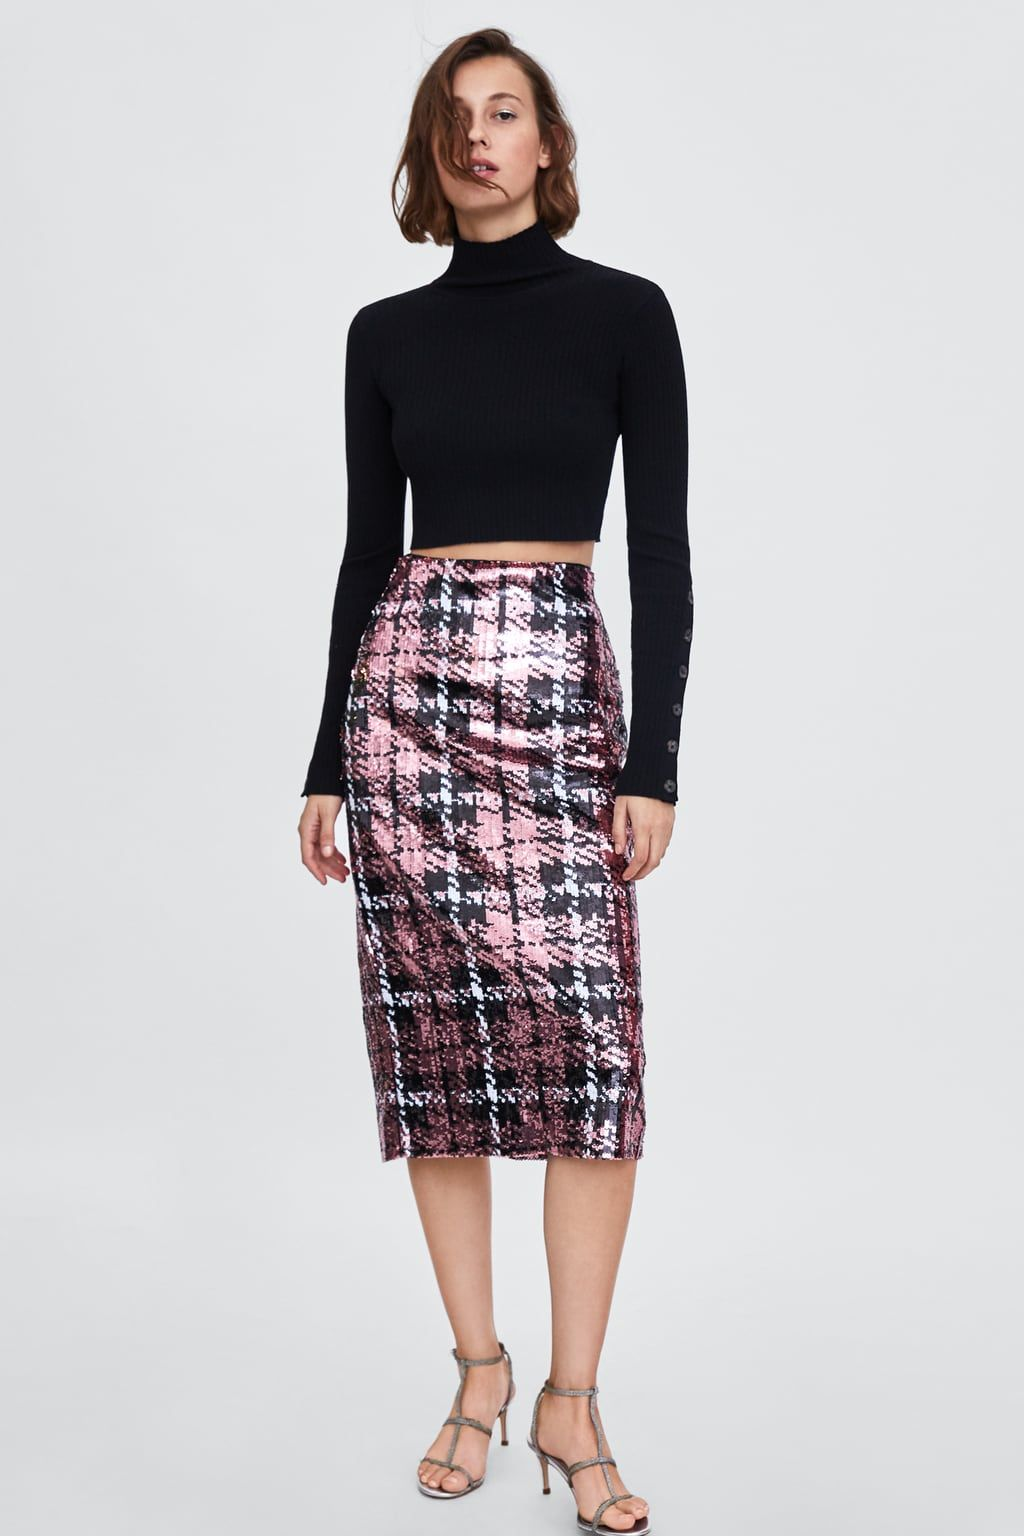 e3cd6097b FALDA MIDI LENTEJUELAS in 2019 | Zara | Zara fashion, Skirts, Midi skirt